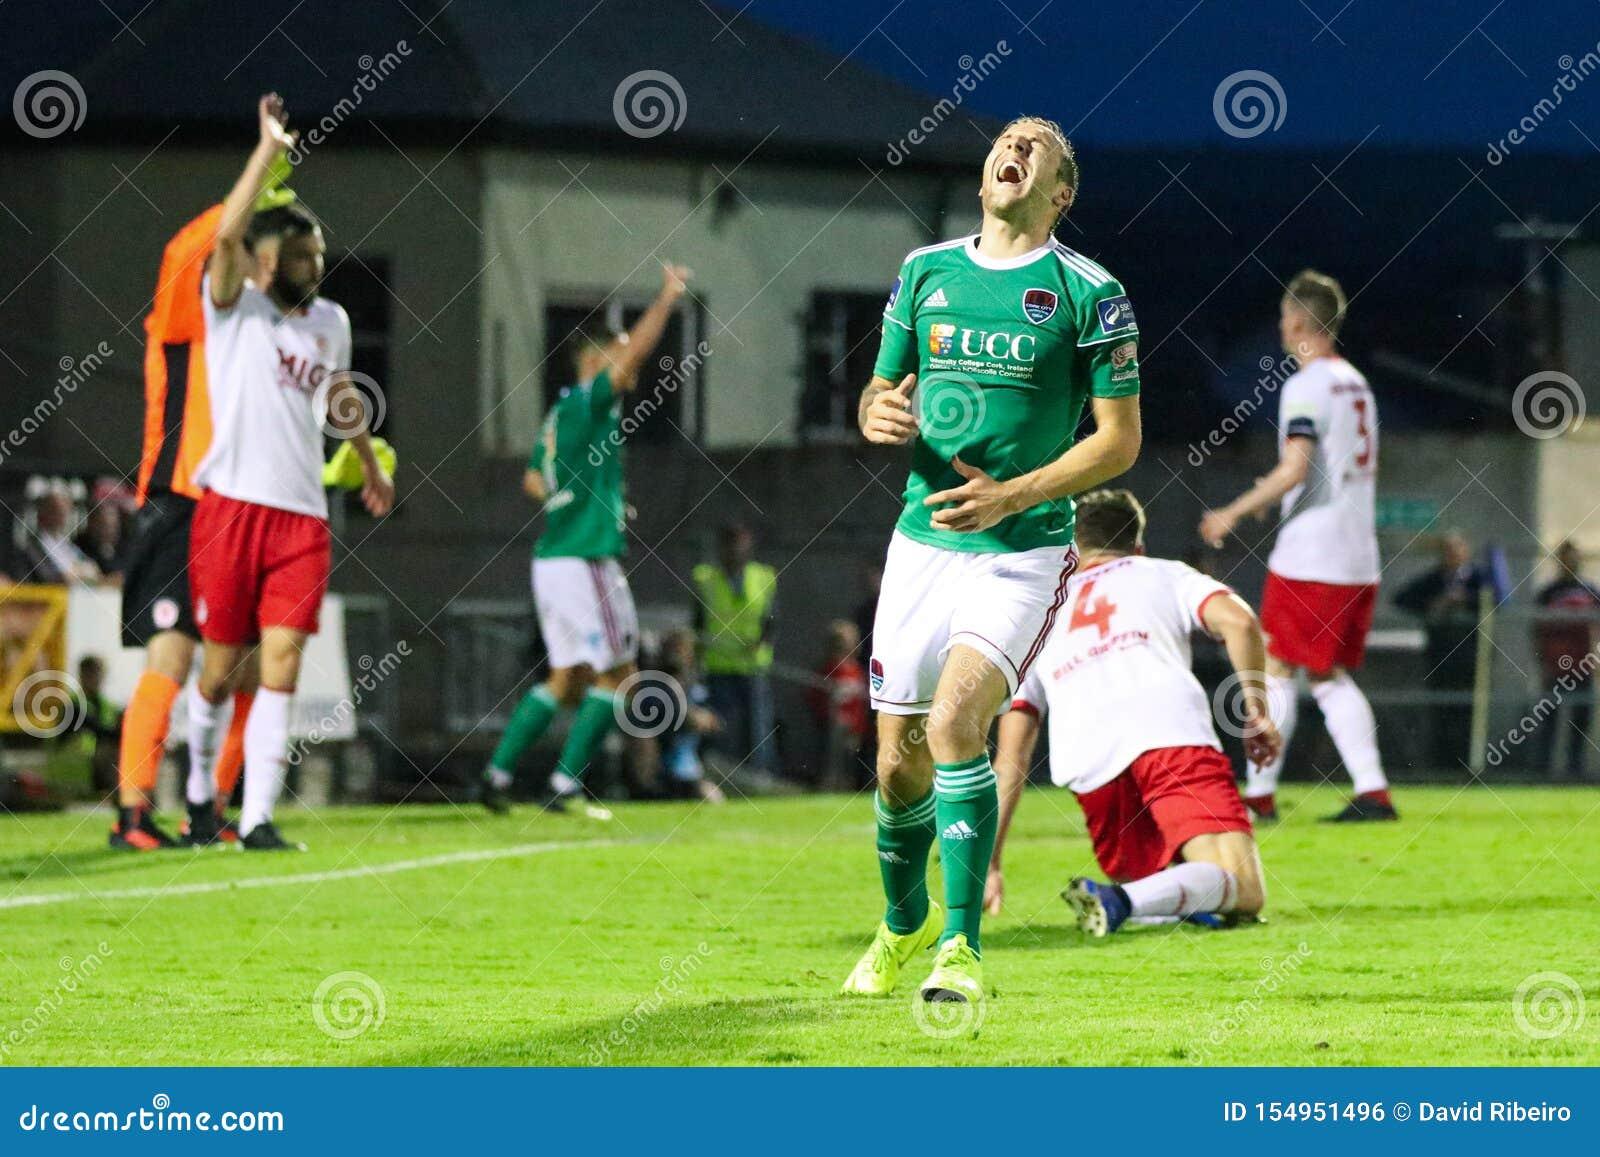 Karl Sheppard at League of Ireland Premier Division match between Cork City FC vs St Patricks Athletic FC